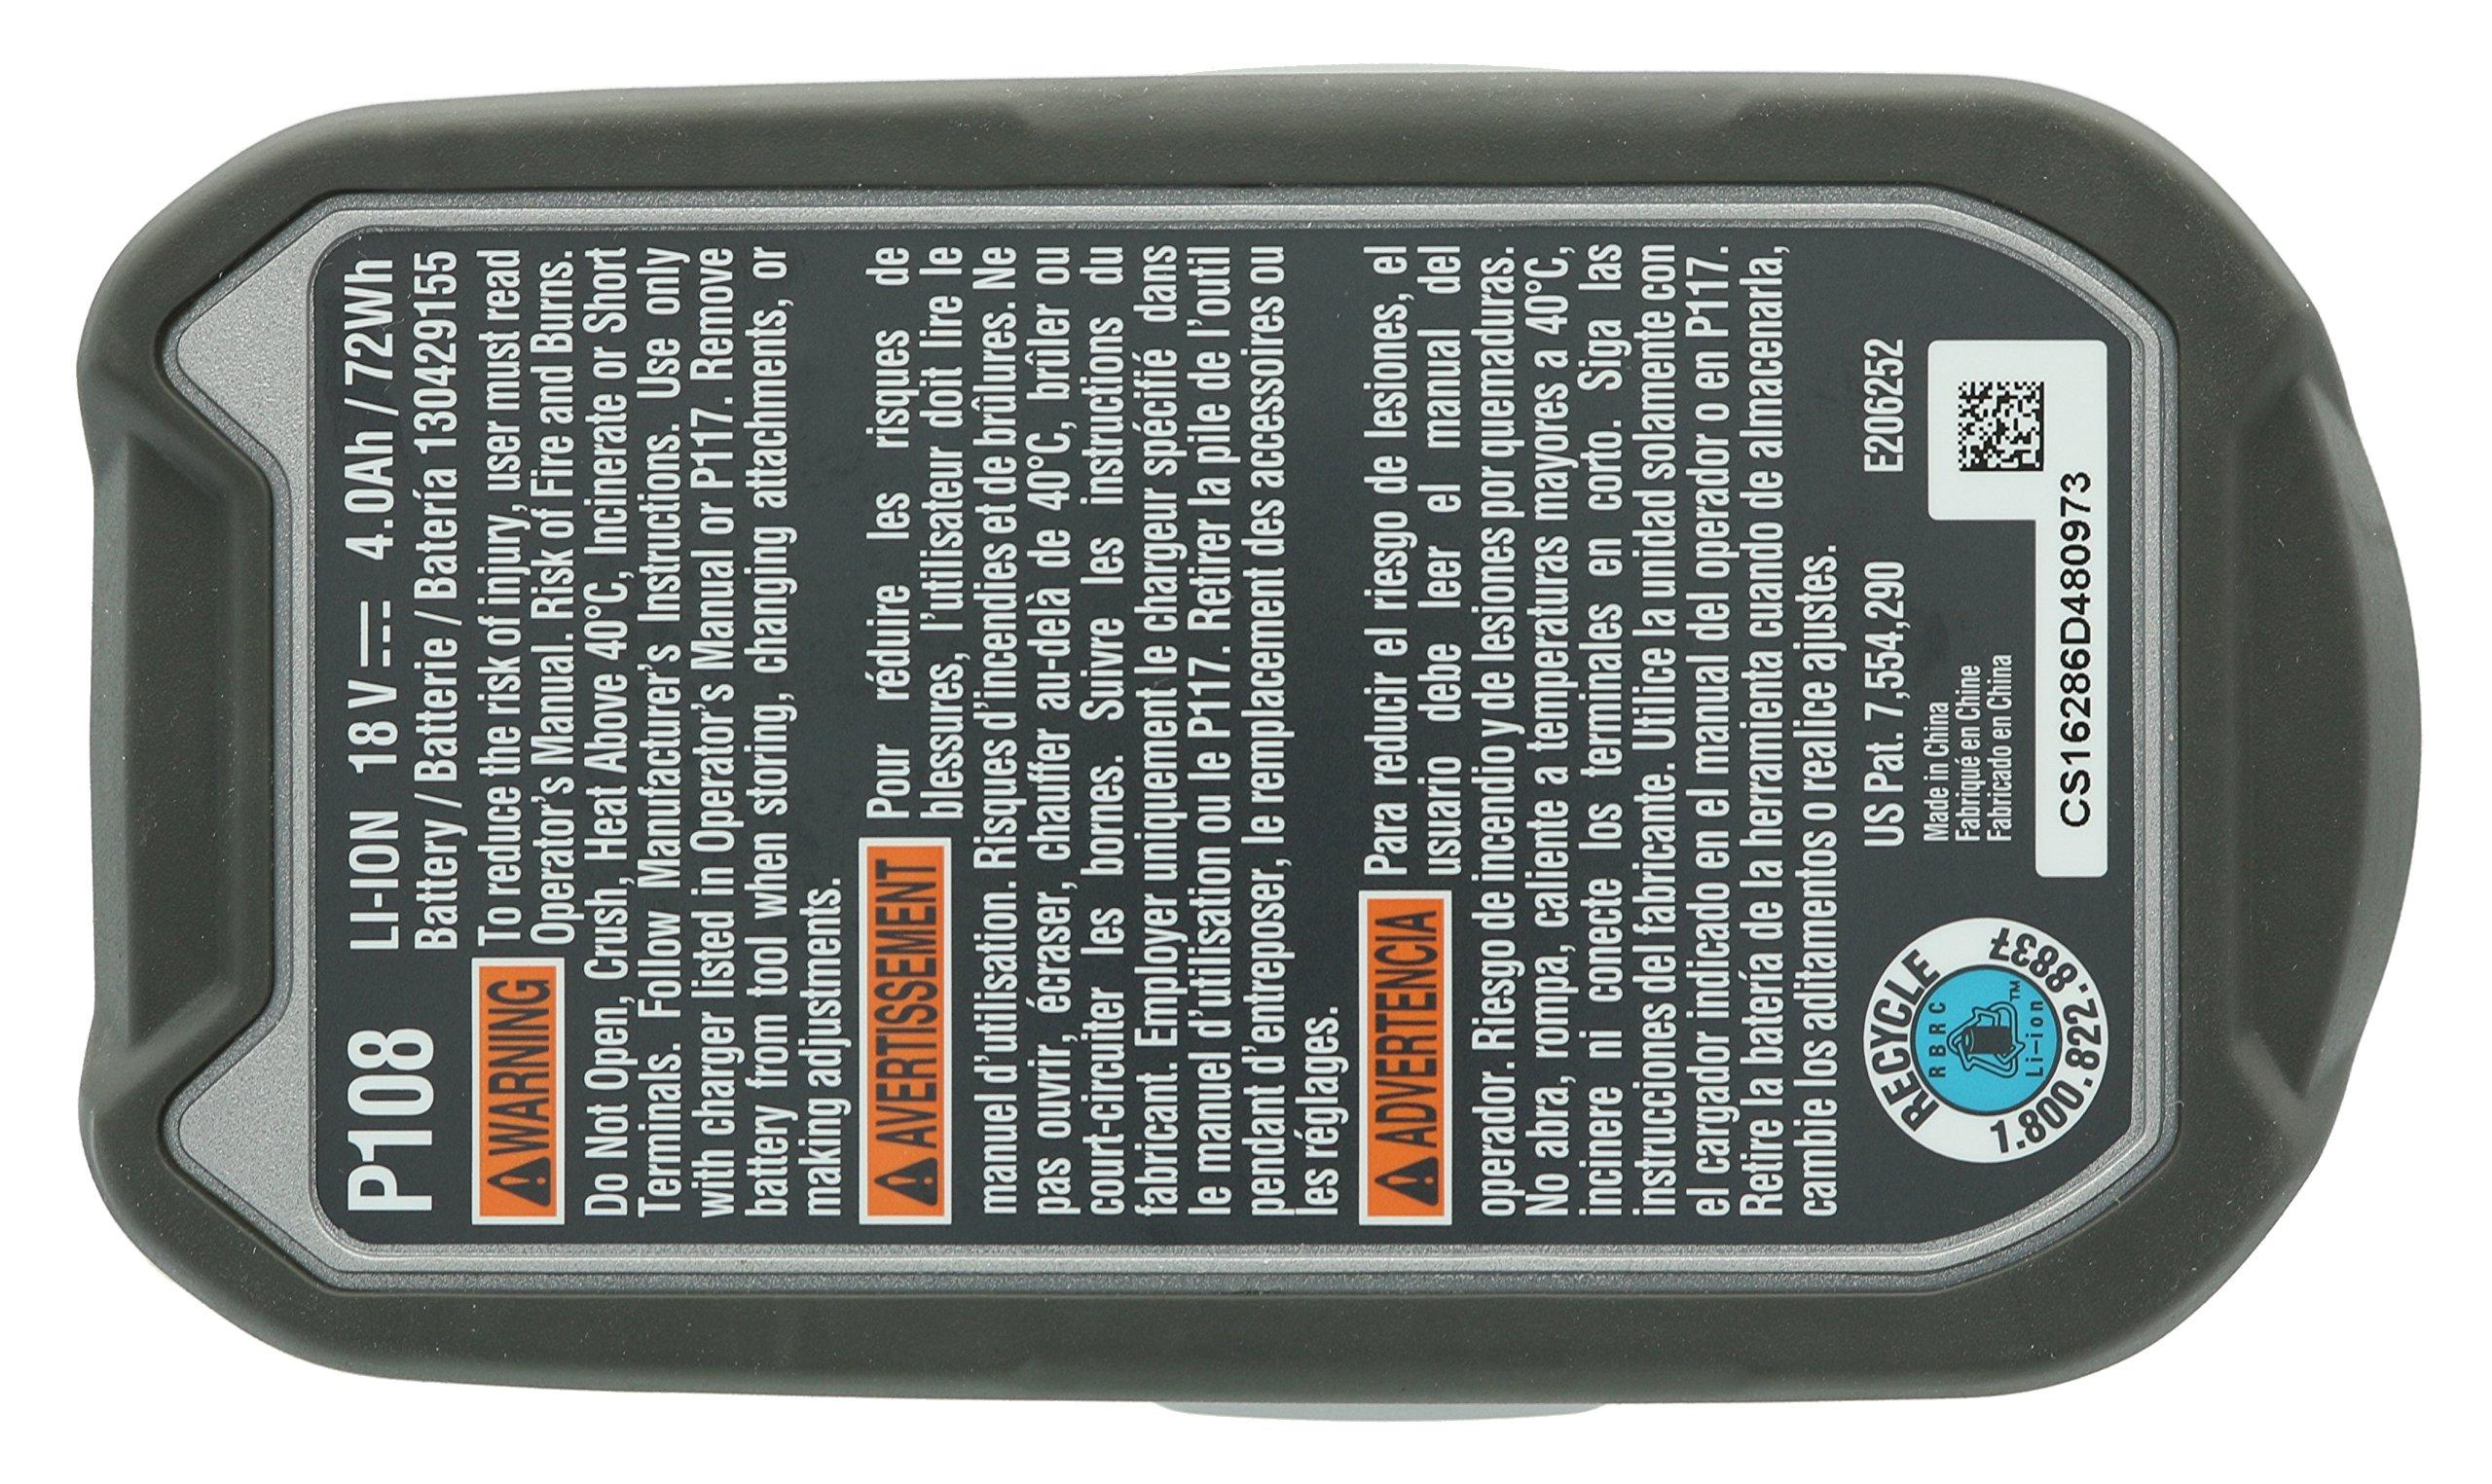 Ryobi P122 4AH One+ High Capacity Lithium Ion Batteries For Ryobi Power Tools (2 Pack of P108 Batteries) by Ryobi (Image #8)